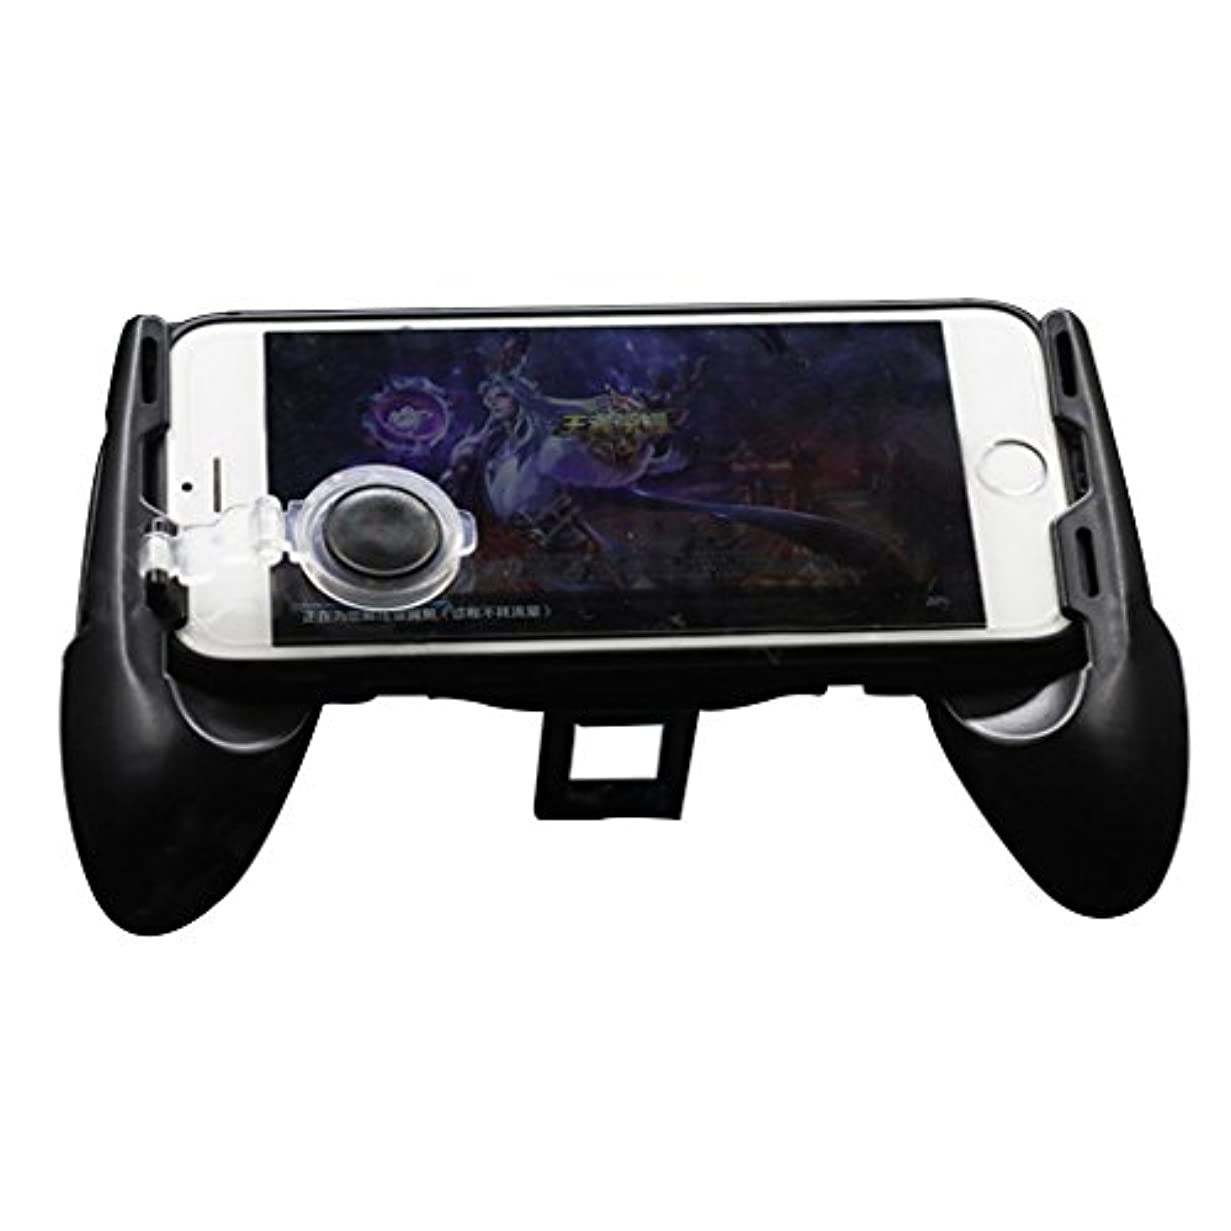 City-Center コントローラー ハンドルホルダー ジョイスティック付き 携帯電話適用 人体工学 MOBA FPS ACT ゲームに適用 操作が簡単